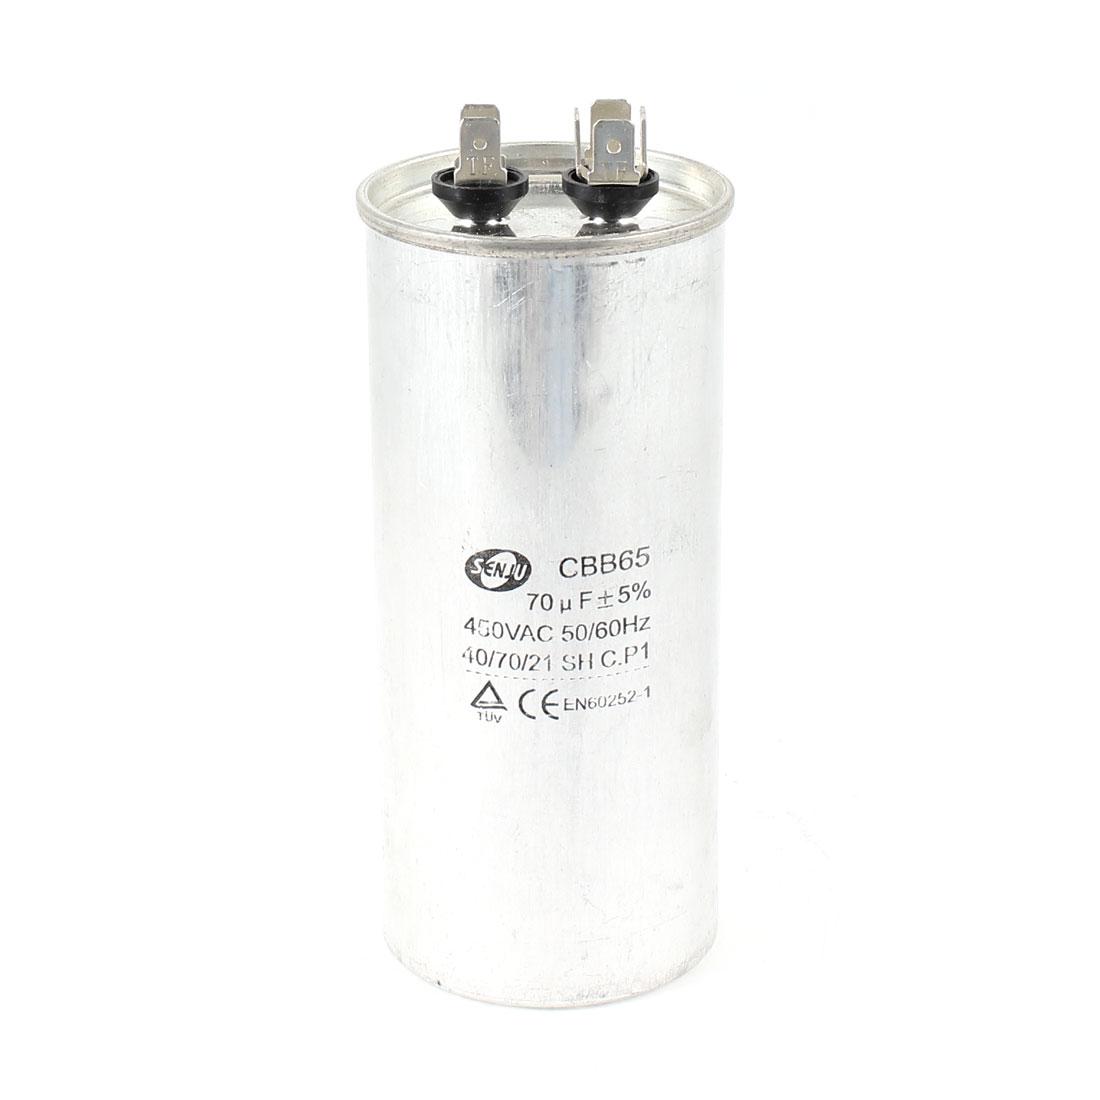 AC 450V 70uF 50/60Hz CBB65 Polypropylene Film Motor Capacitor